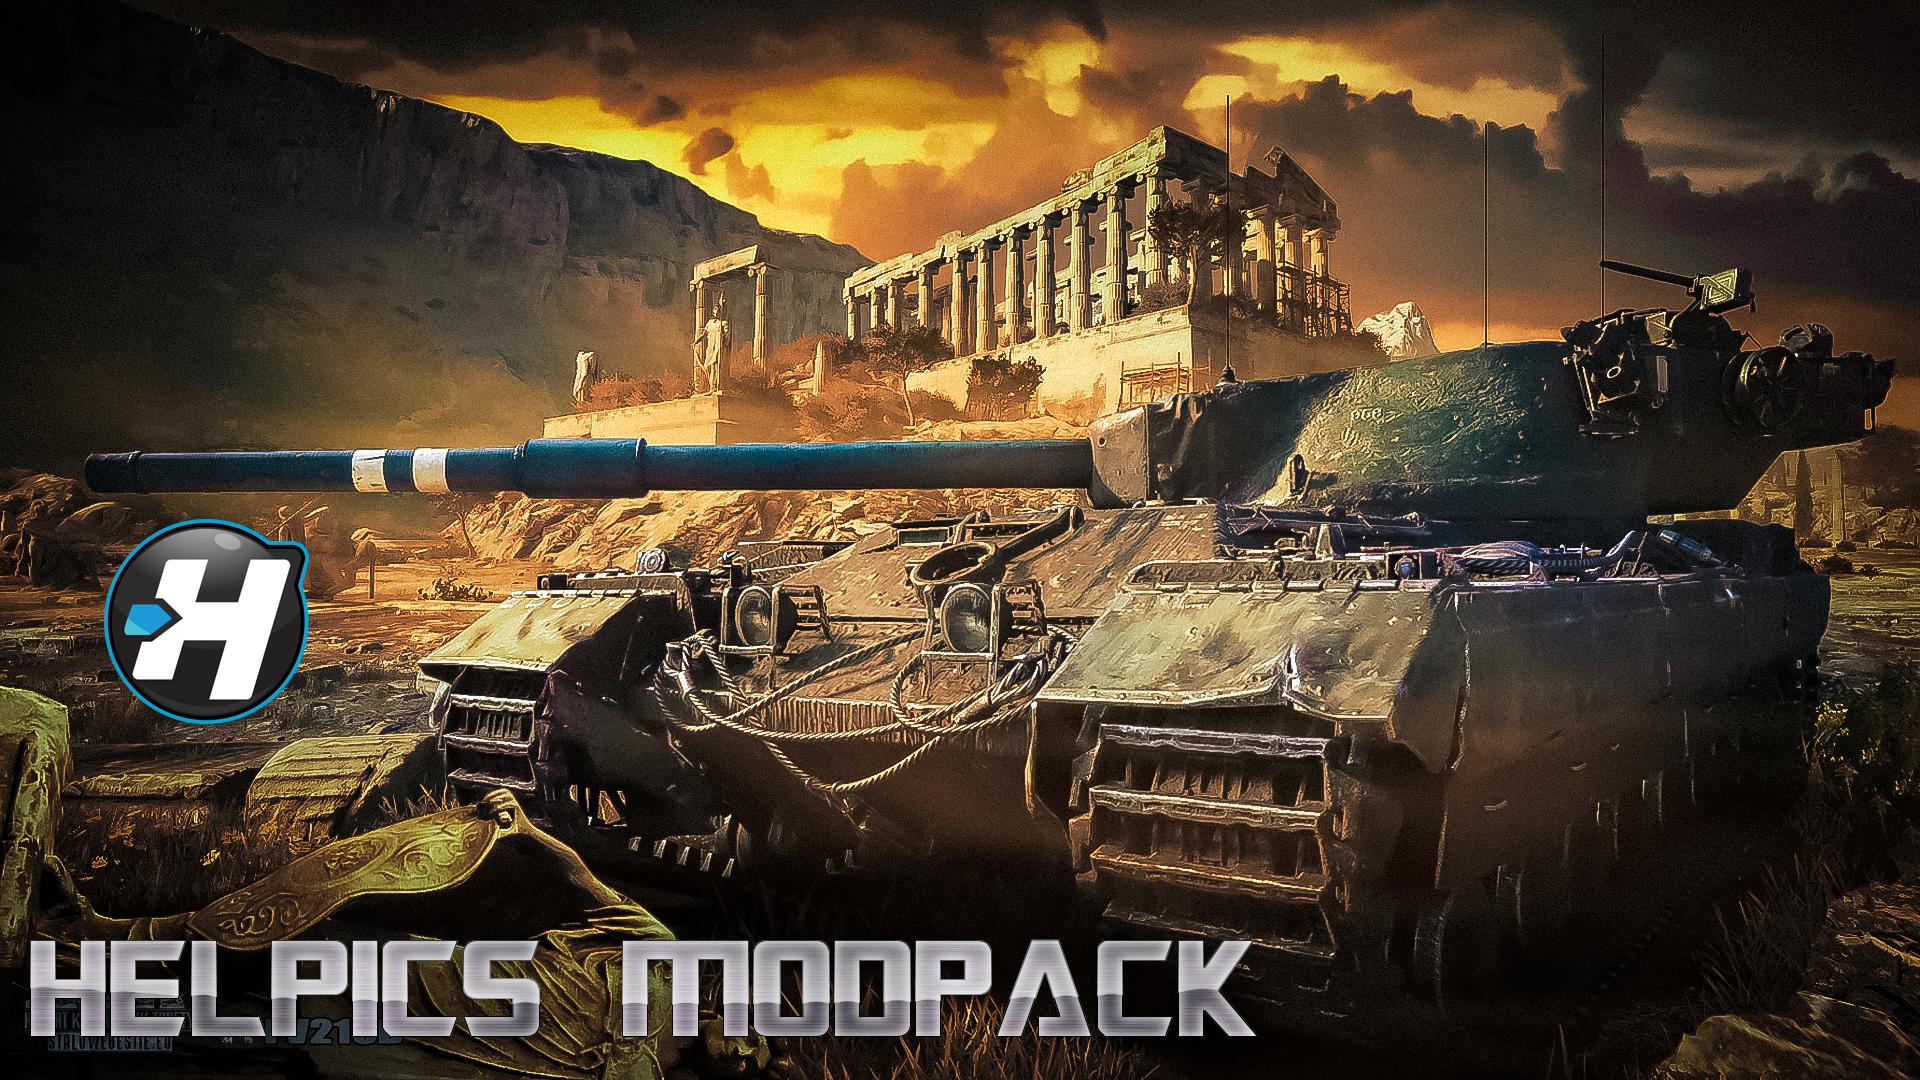 1.7.0.1 Helpics Modpack v. 4.2.8